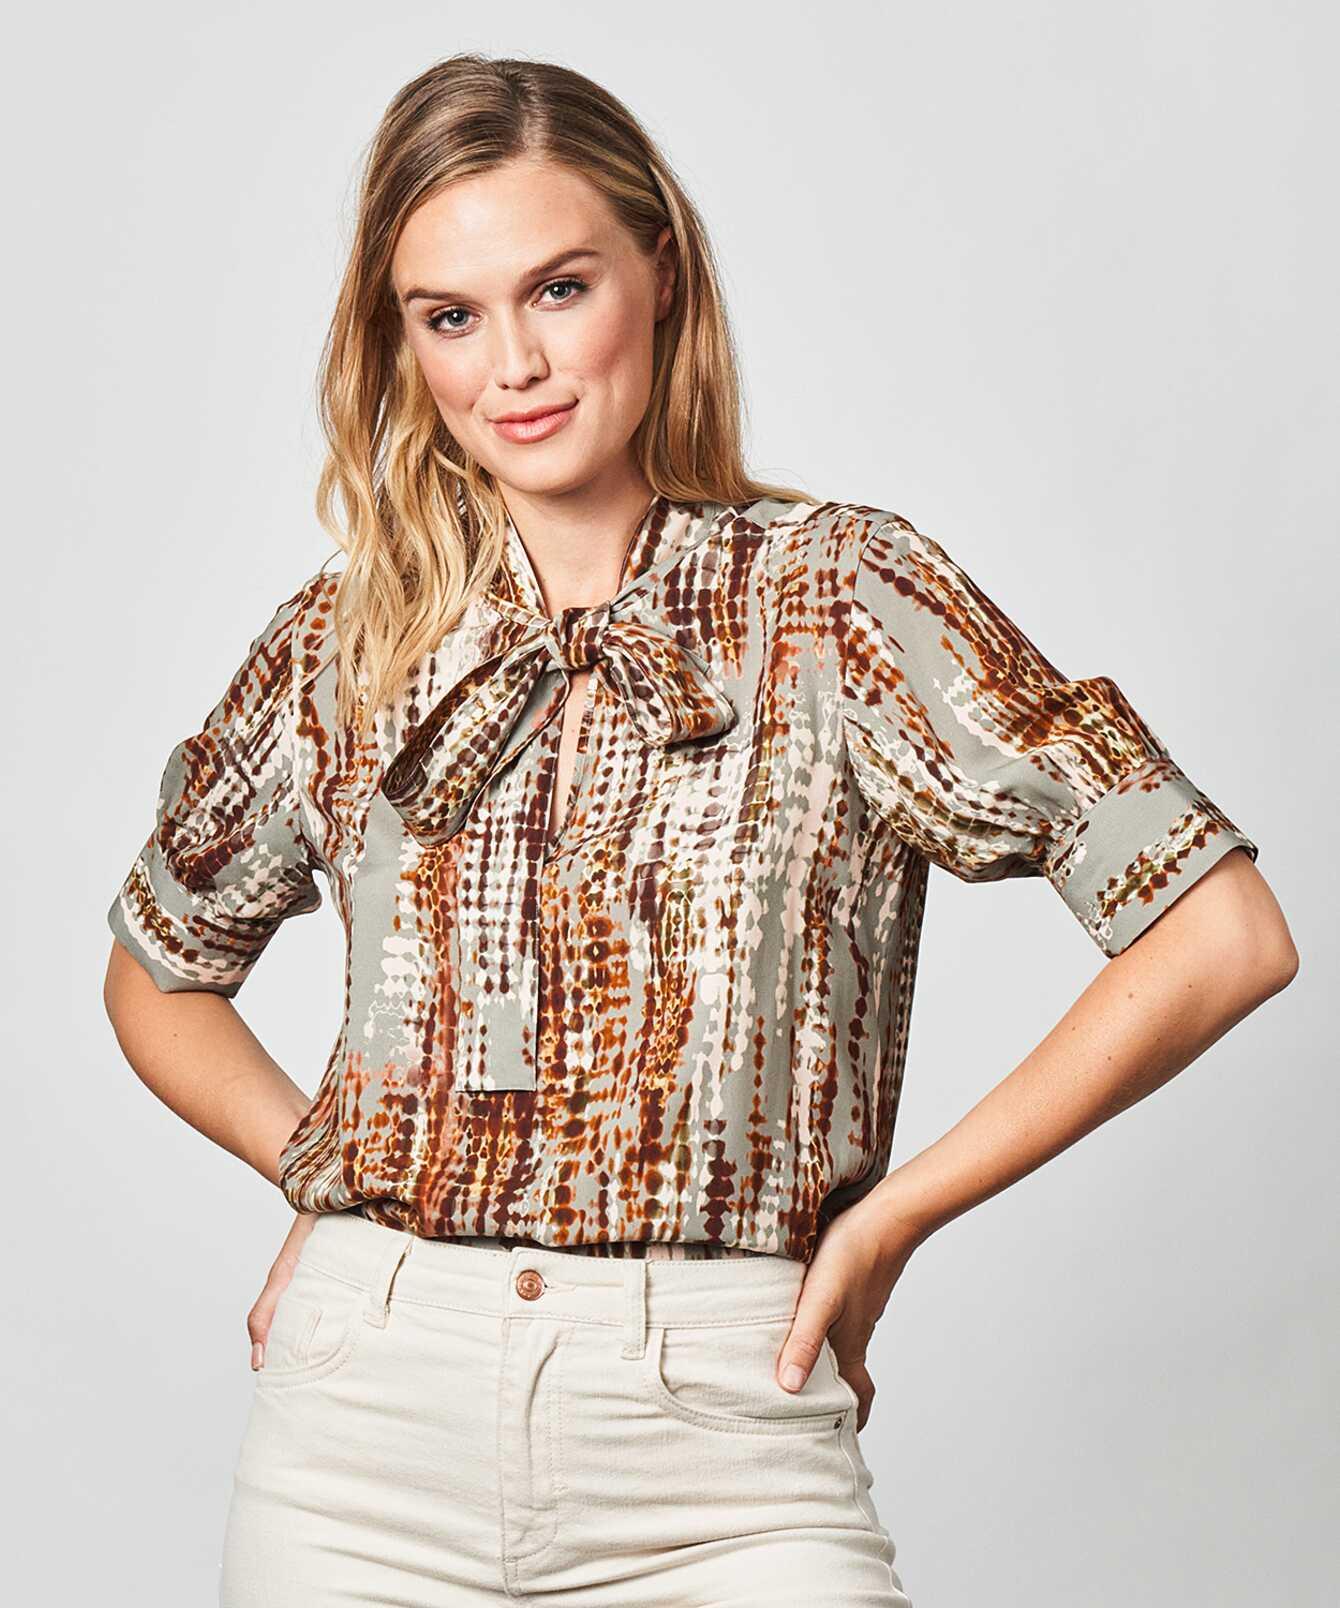 Skjorta Sanna Rush The Shirt Factory